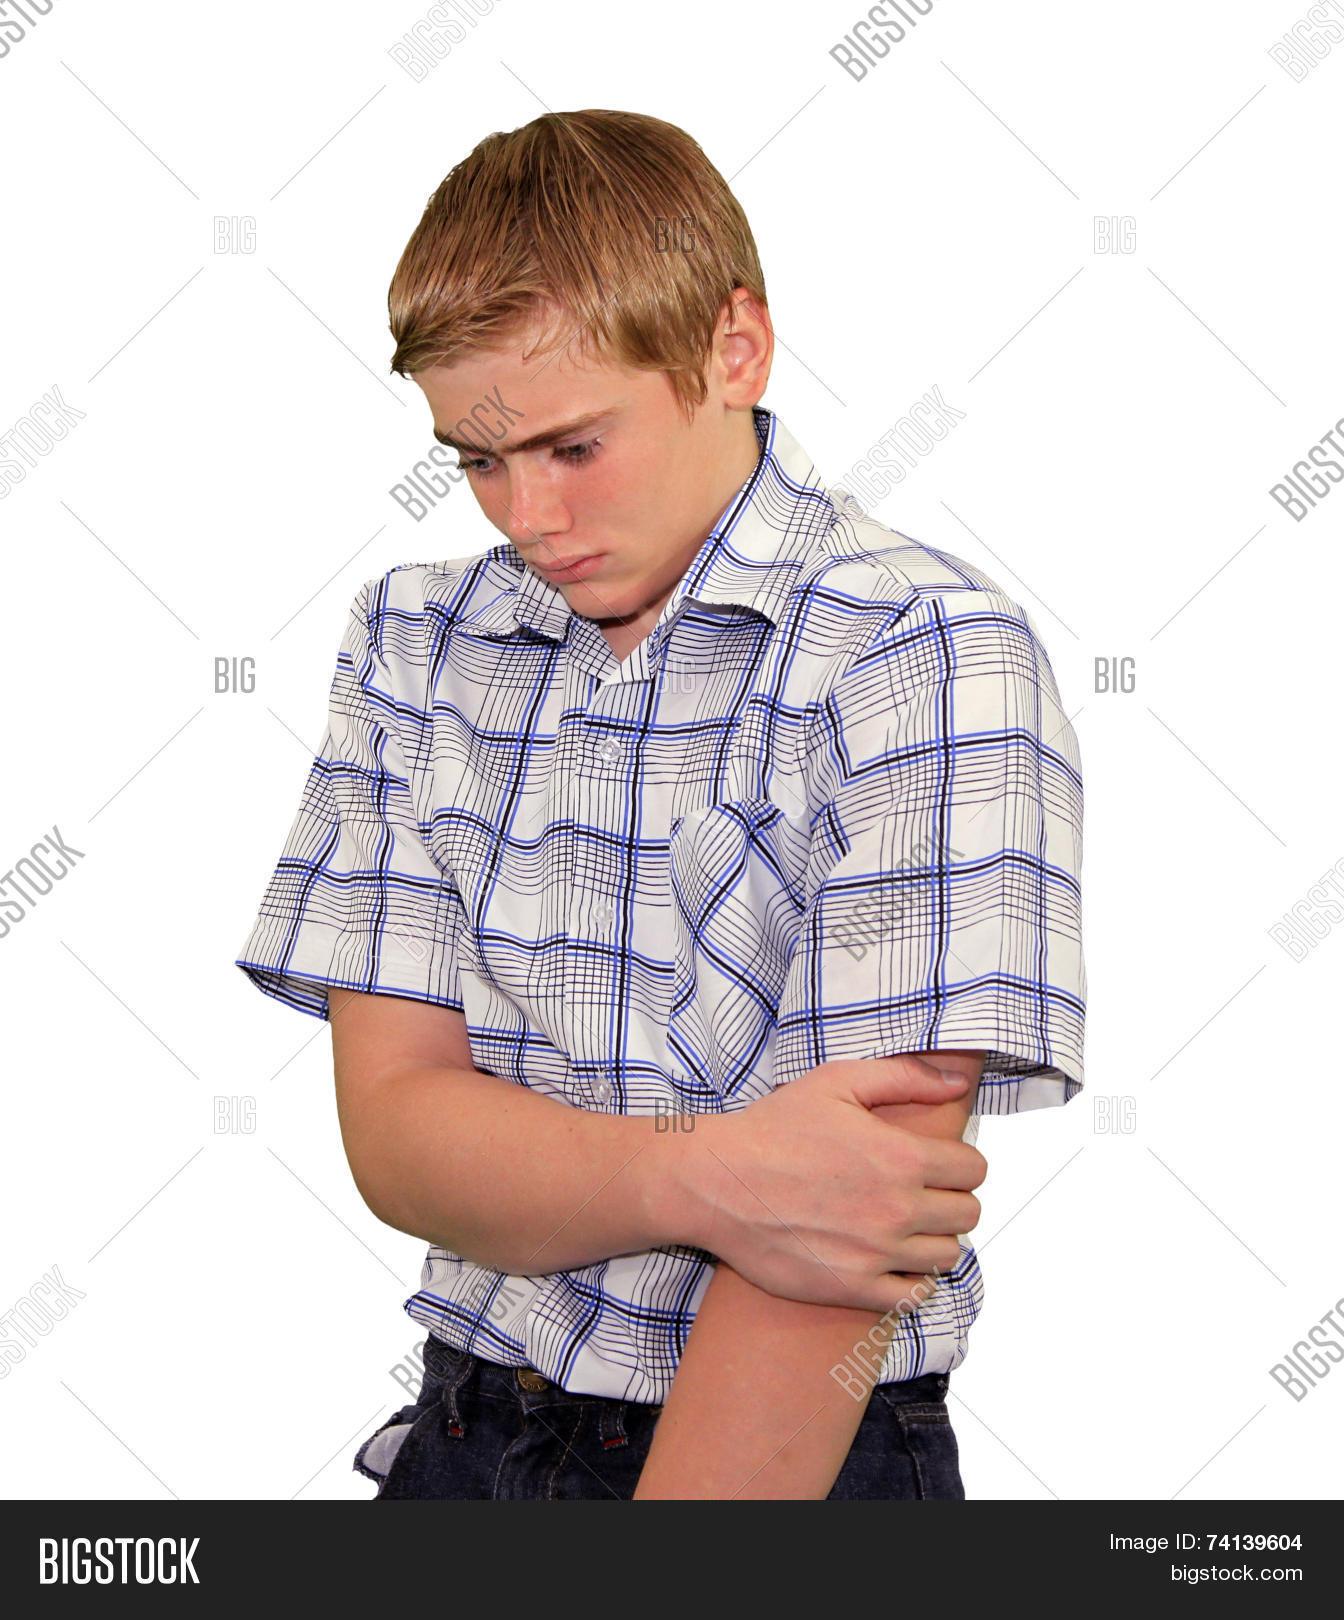 Teen Boy Body Language - Shy Timid Image & Photo   Bigstock